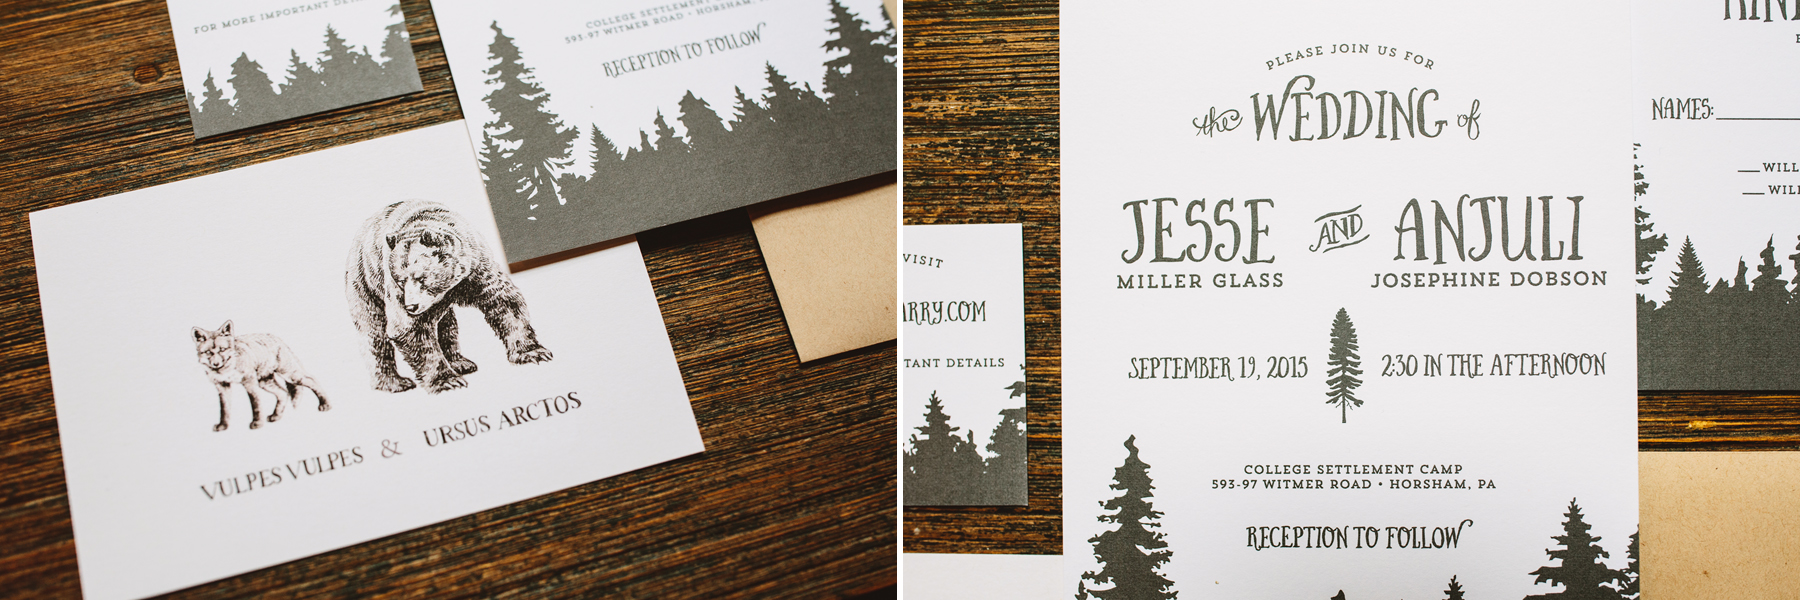 interesting wedding invitations